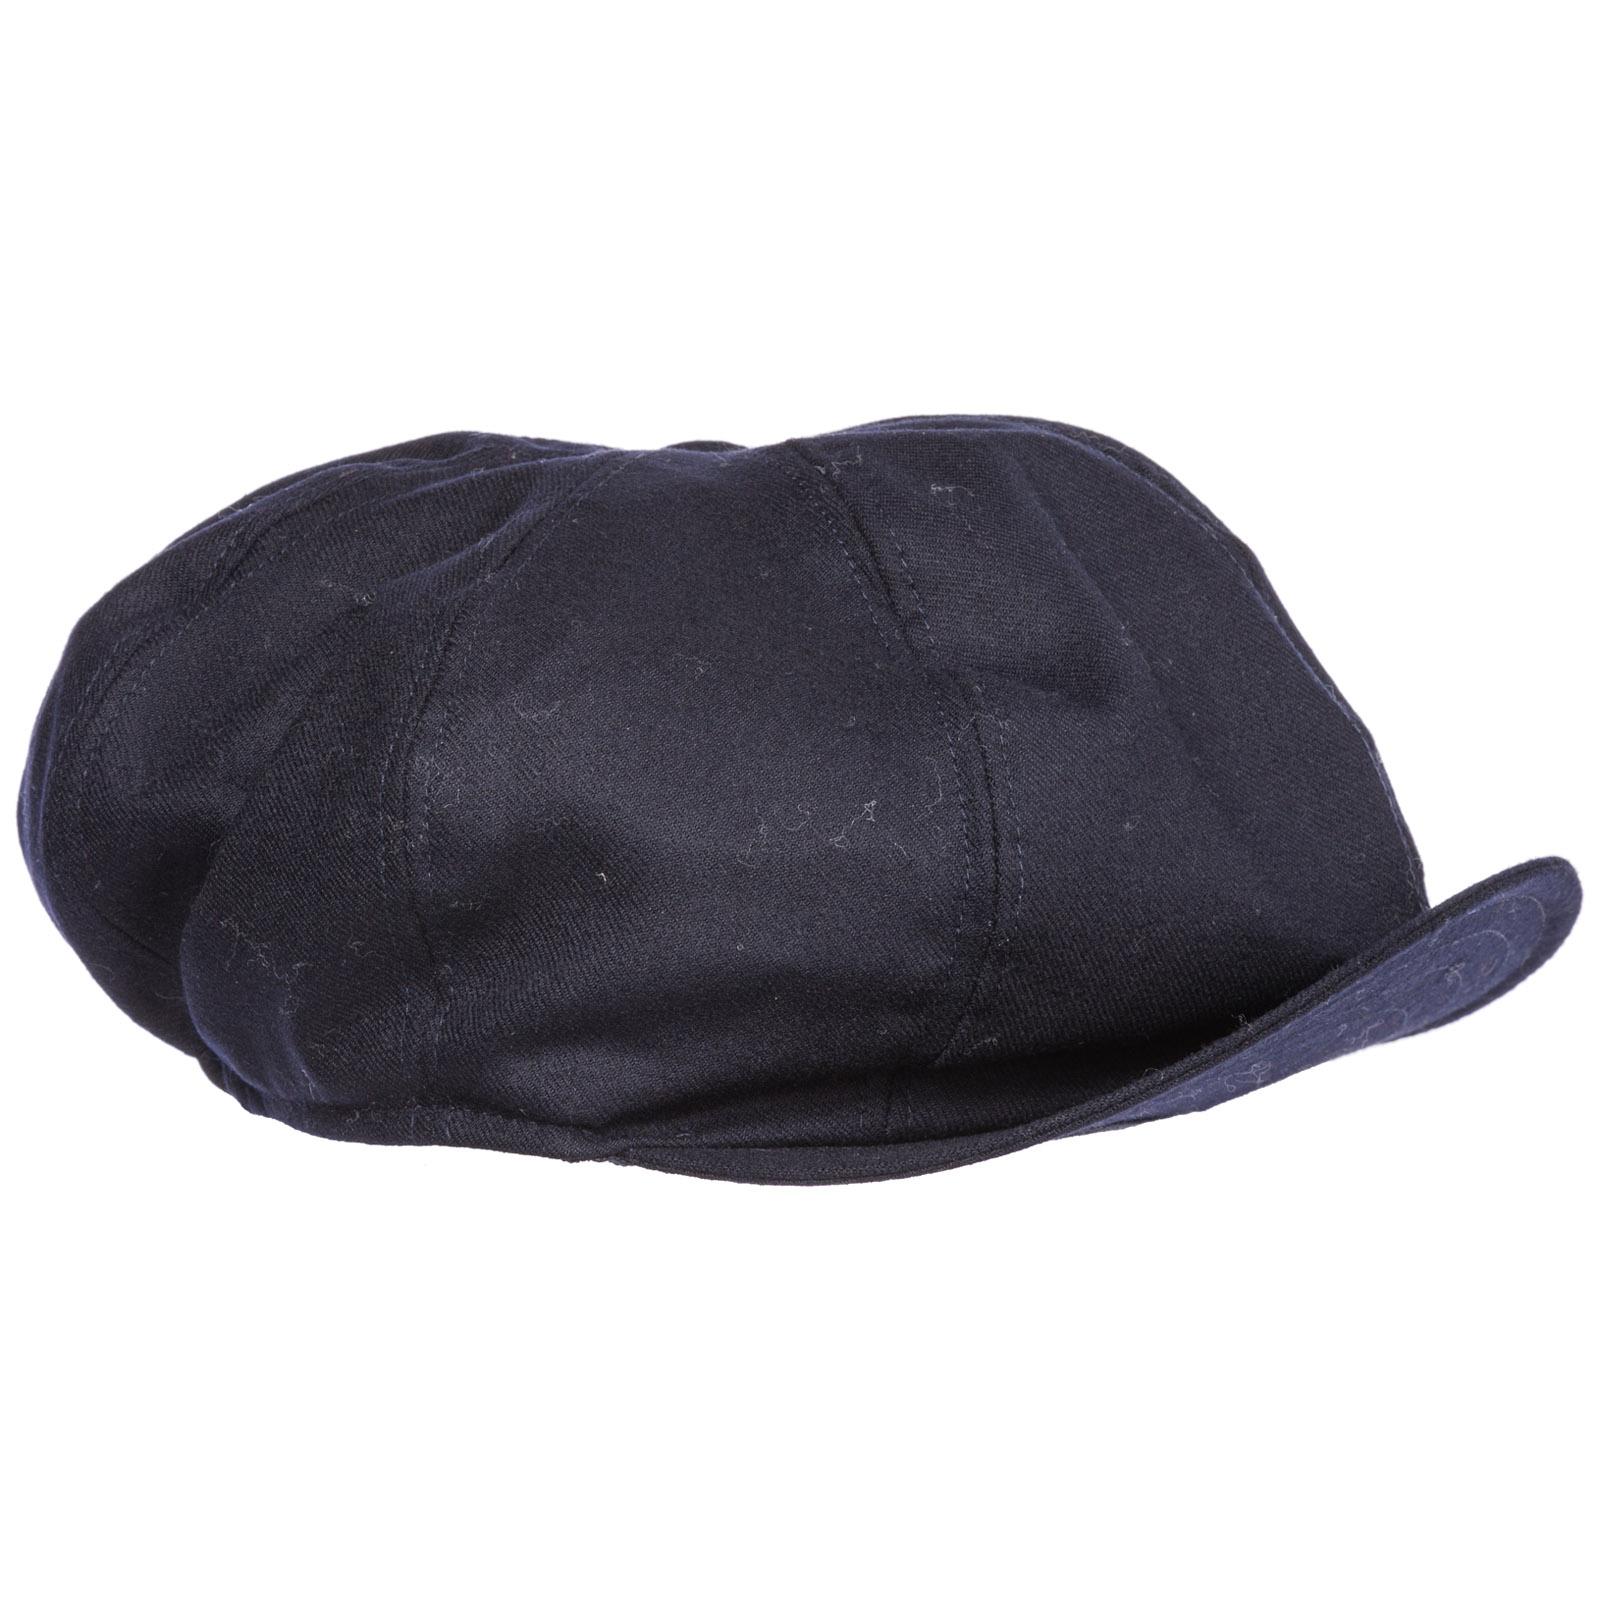 41ee98bb3 Men's flat hat sboy cap gatsby